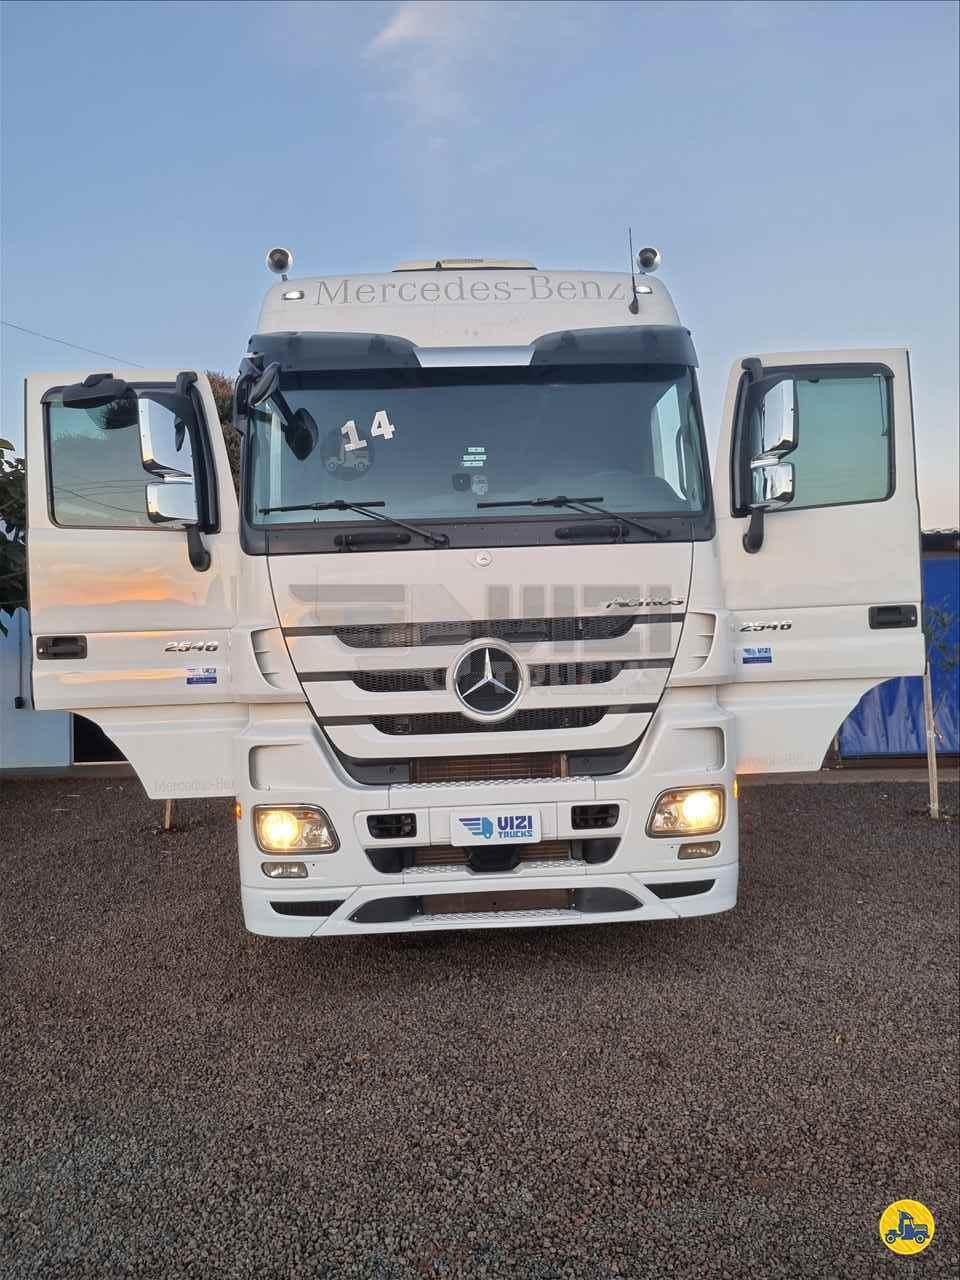 CAMINHAO MERCEDES-BENZ MB 2546 Cavalo Mecânico Truck 6x2 Vizi Trucks DOIS VIZINHOS PARANÁ PR